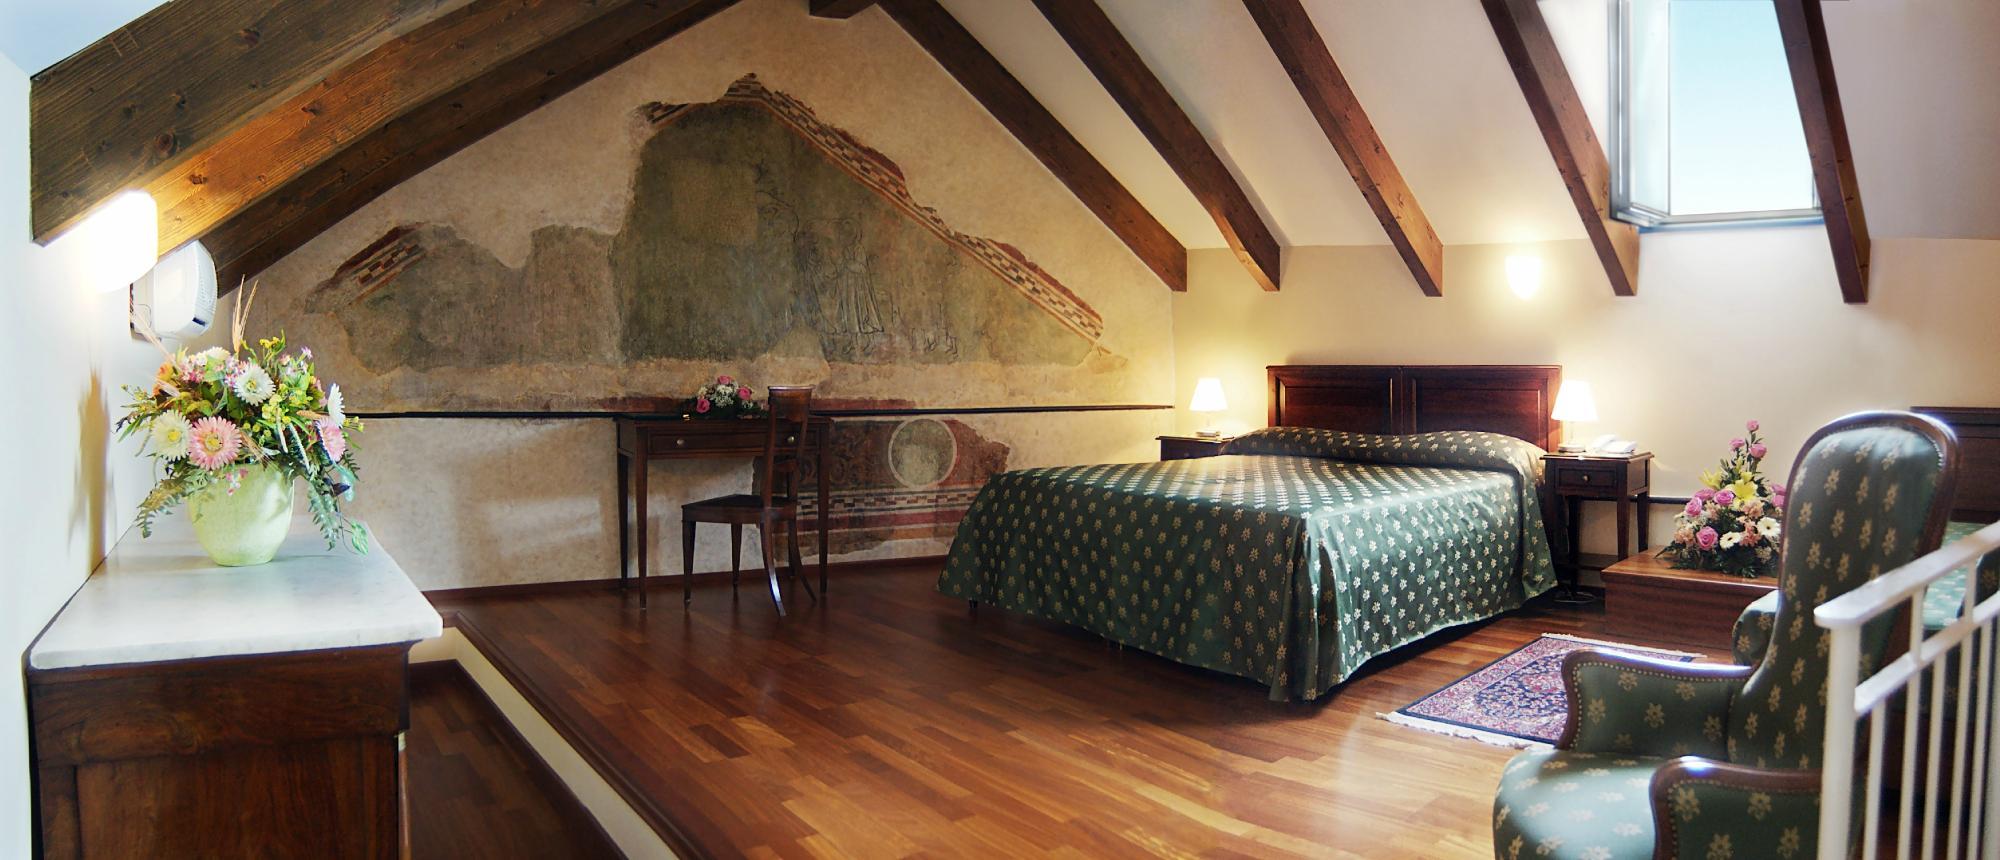 Albergo Palazzo Vescovile - Residenza D'Epoca